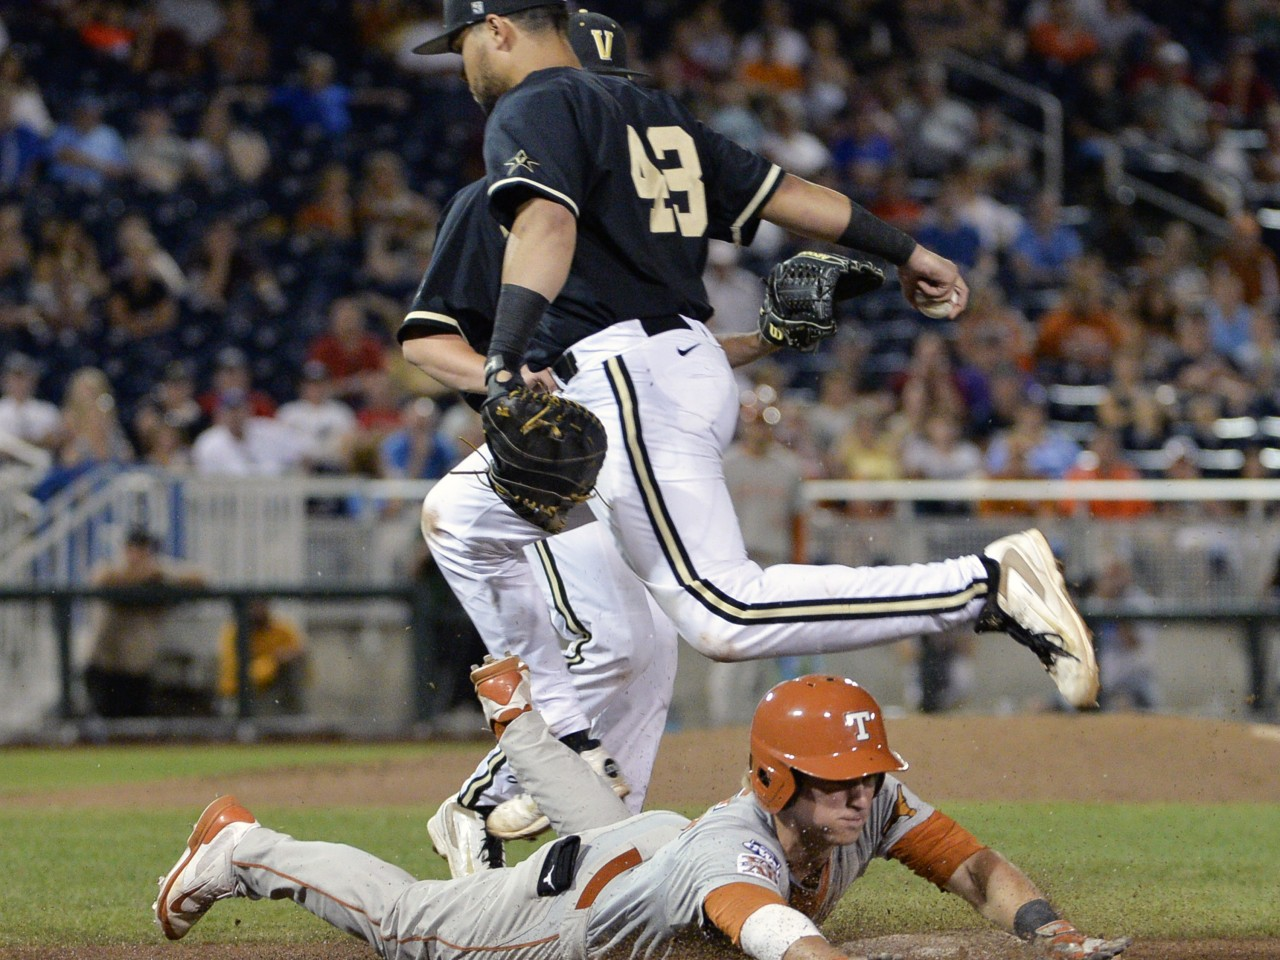 Vanderbilt Baseball  NCAAcom